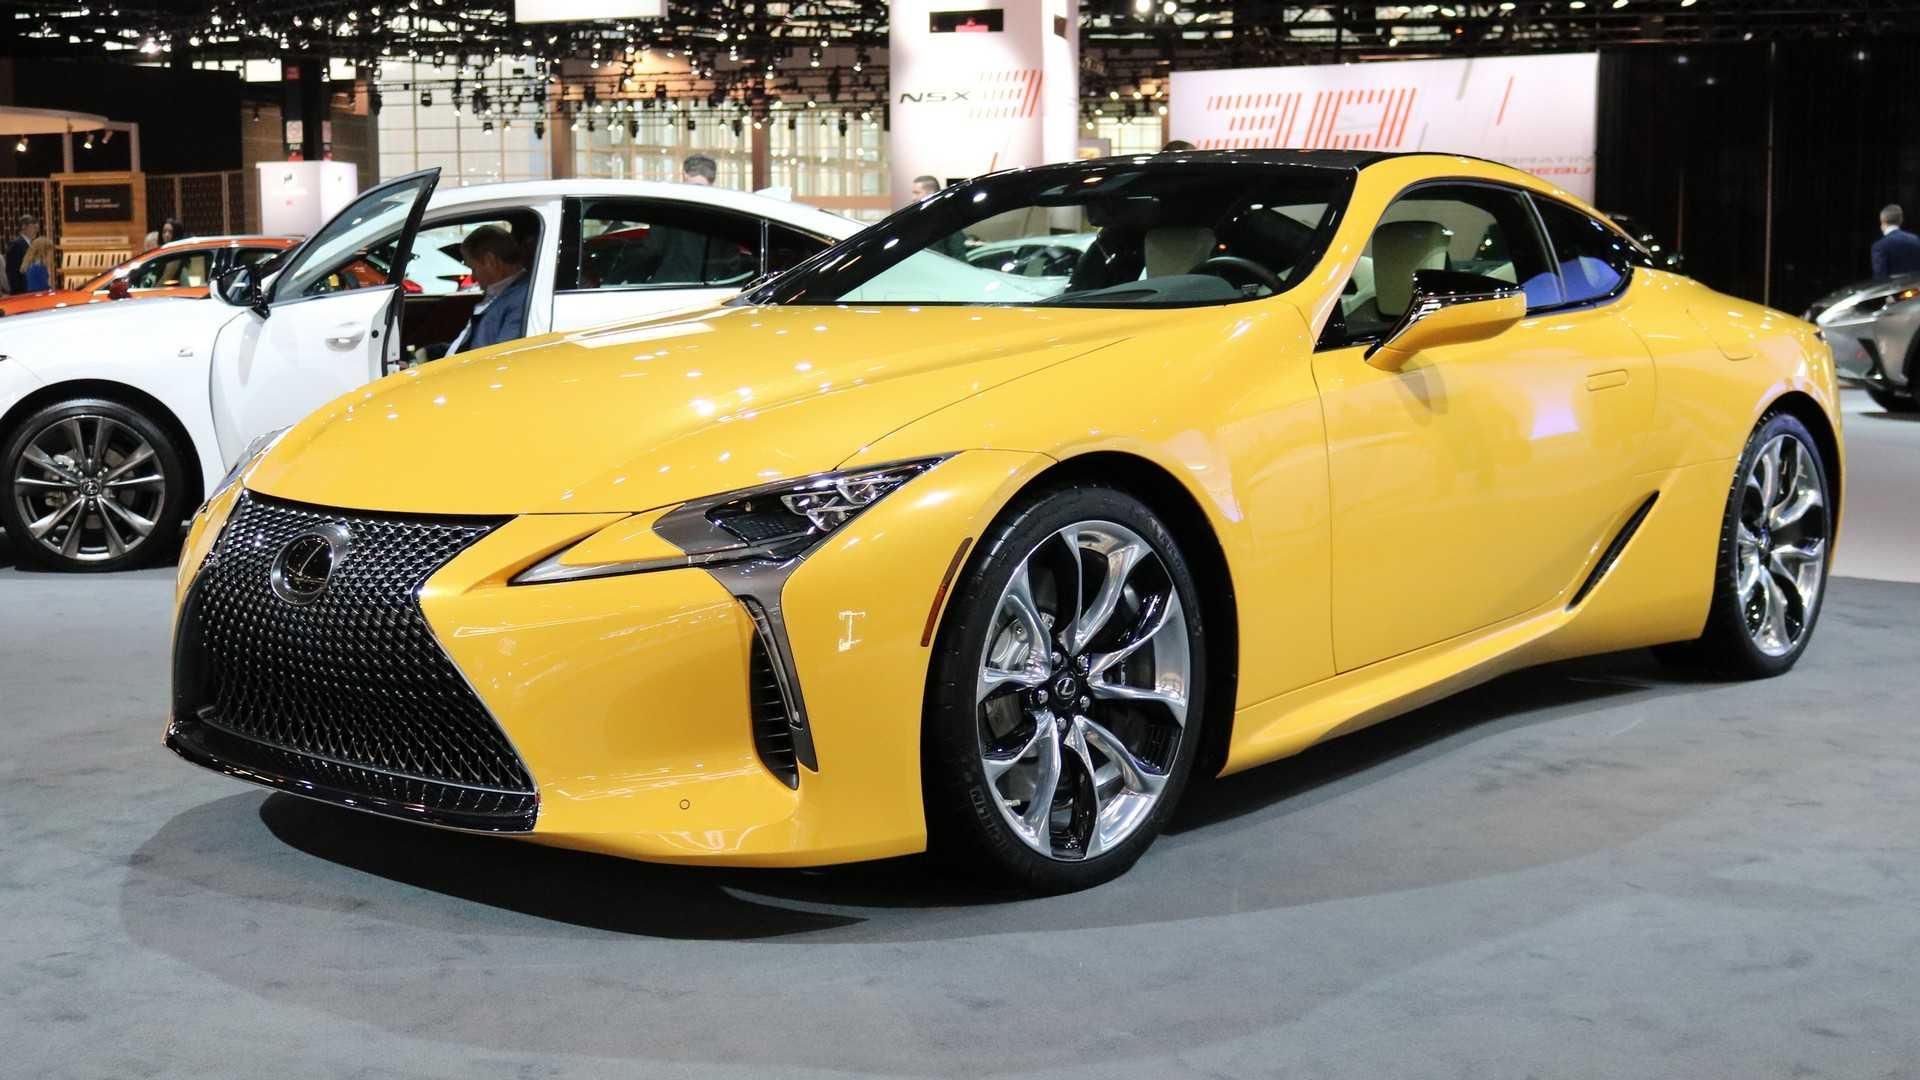 2019 Lexus LC 500 Inspiration